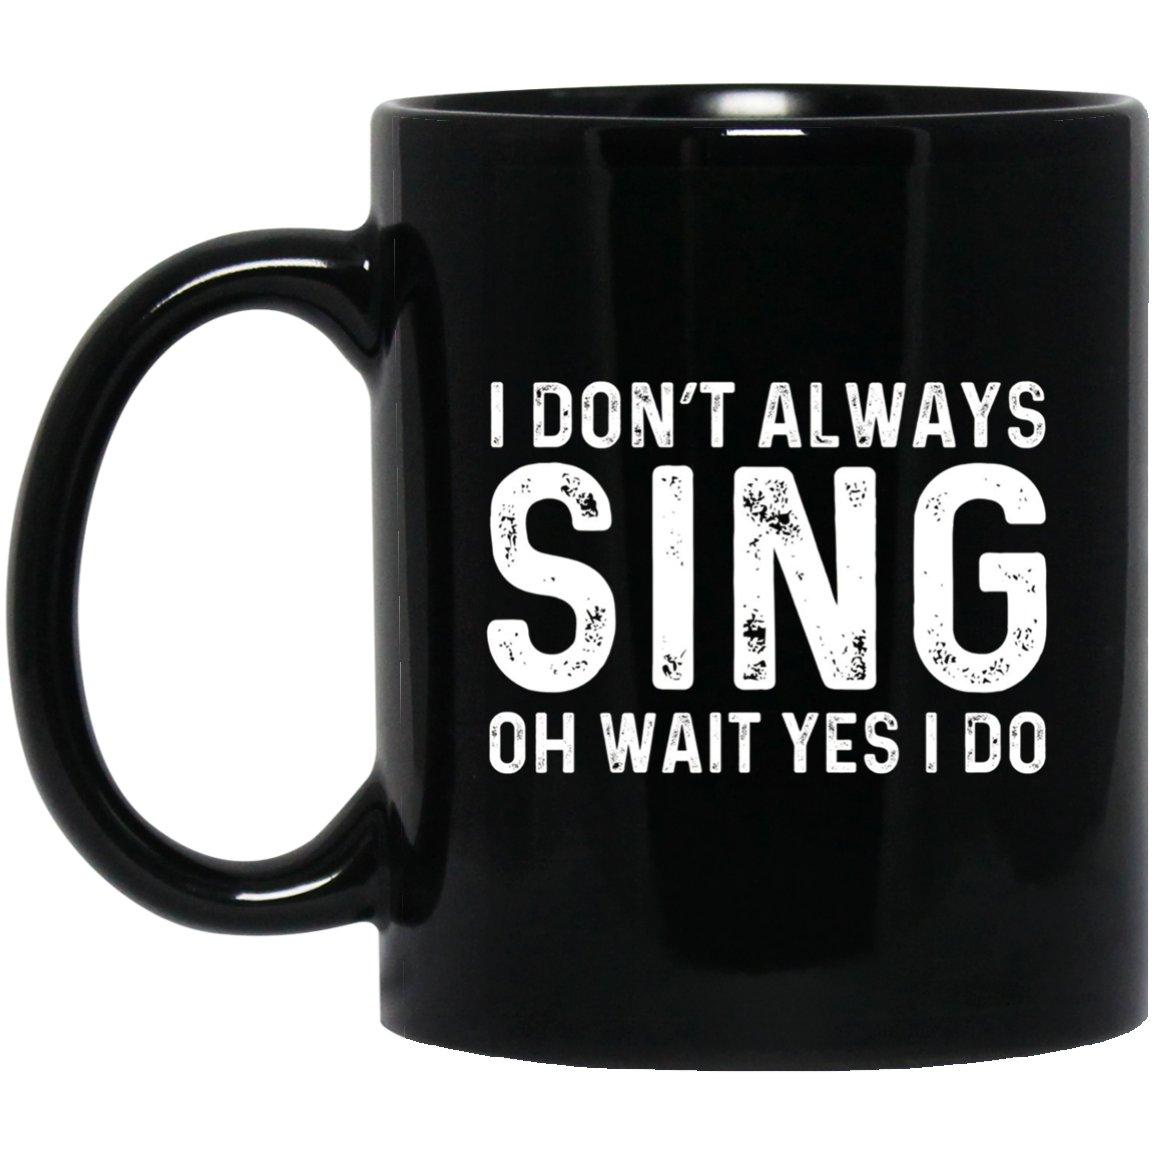 I Dont Always Sing Wait Yes I Do Opera Radio Black  Mug Black Ceramic 11oz Coffee Tea Cup